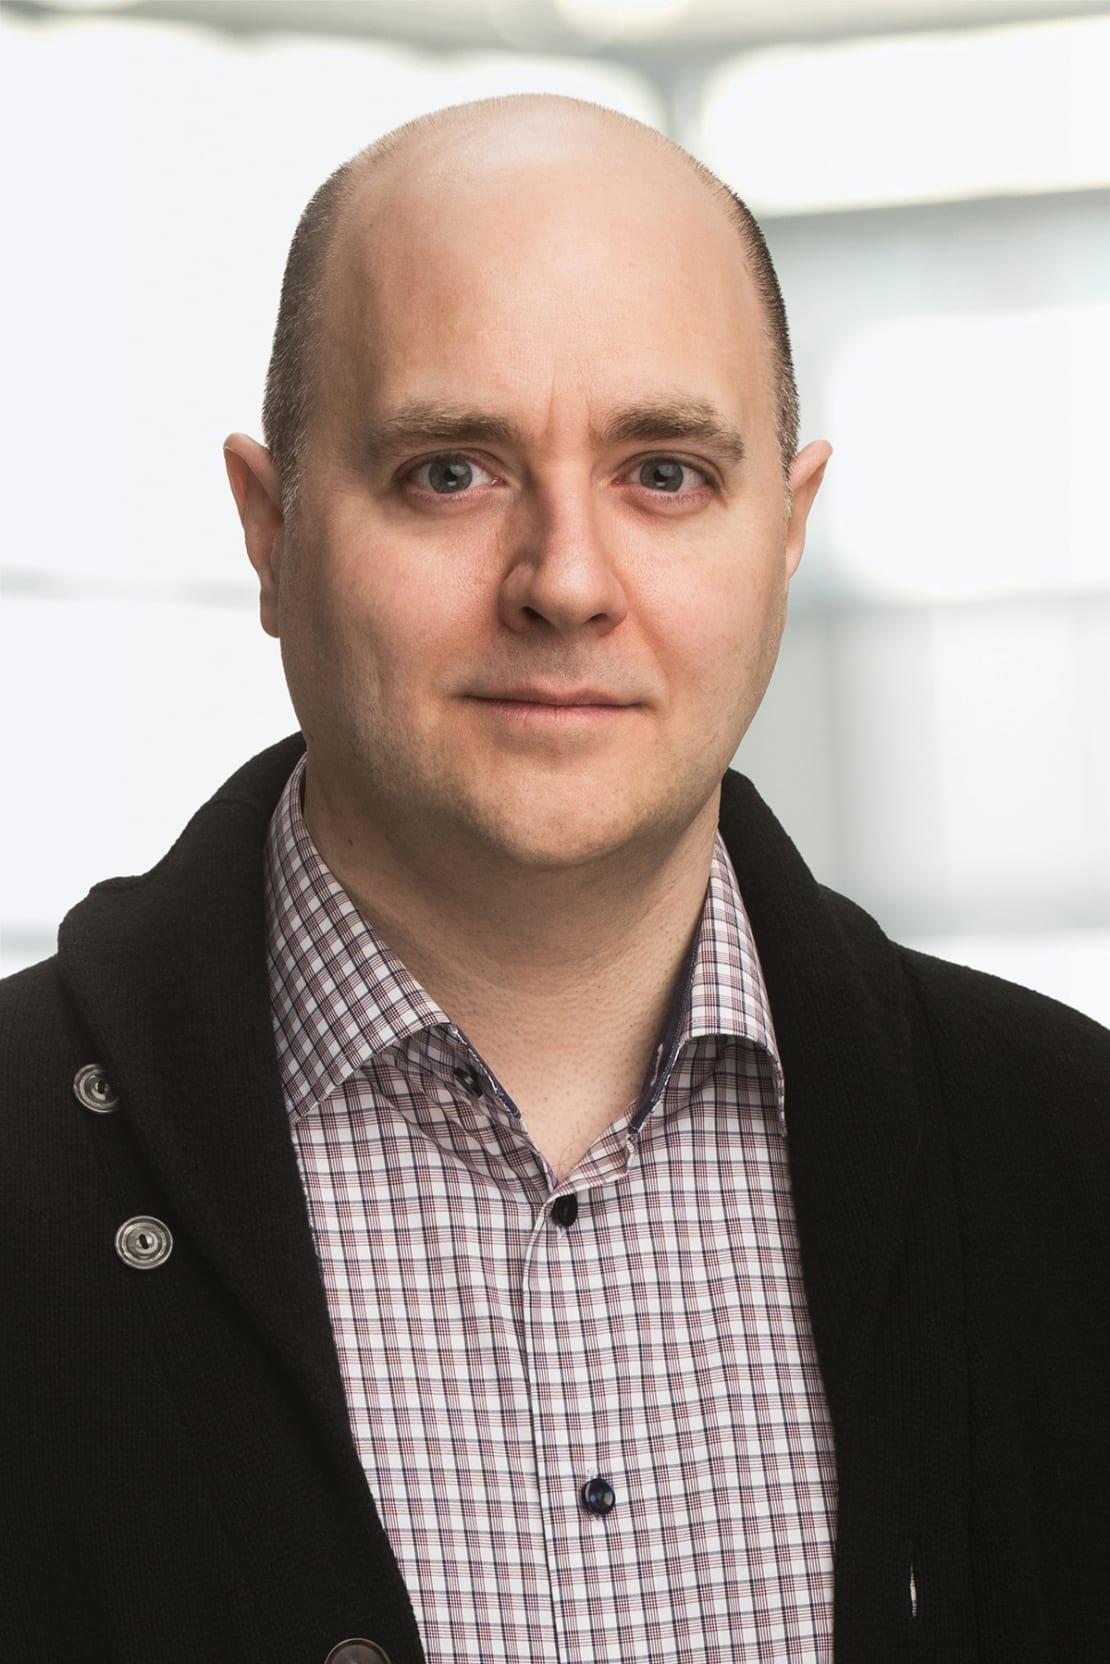 Asst. Prof. Darren Grant